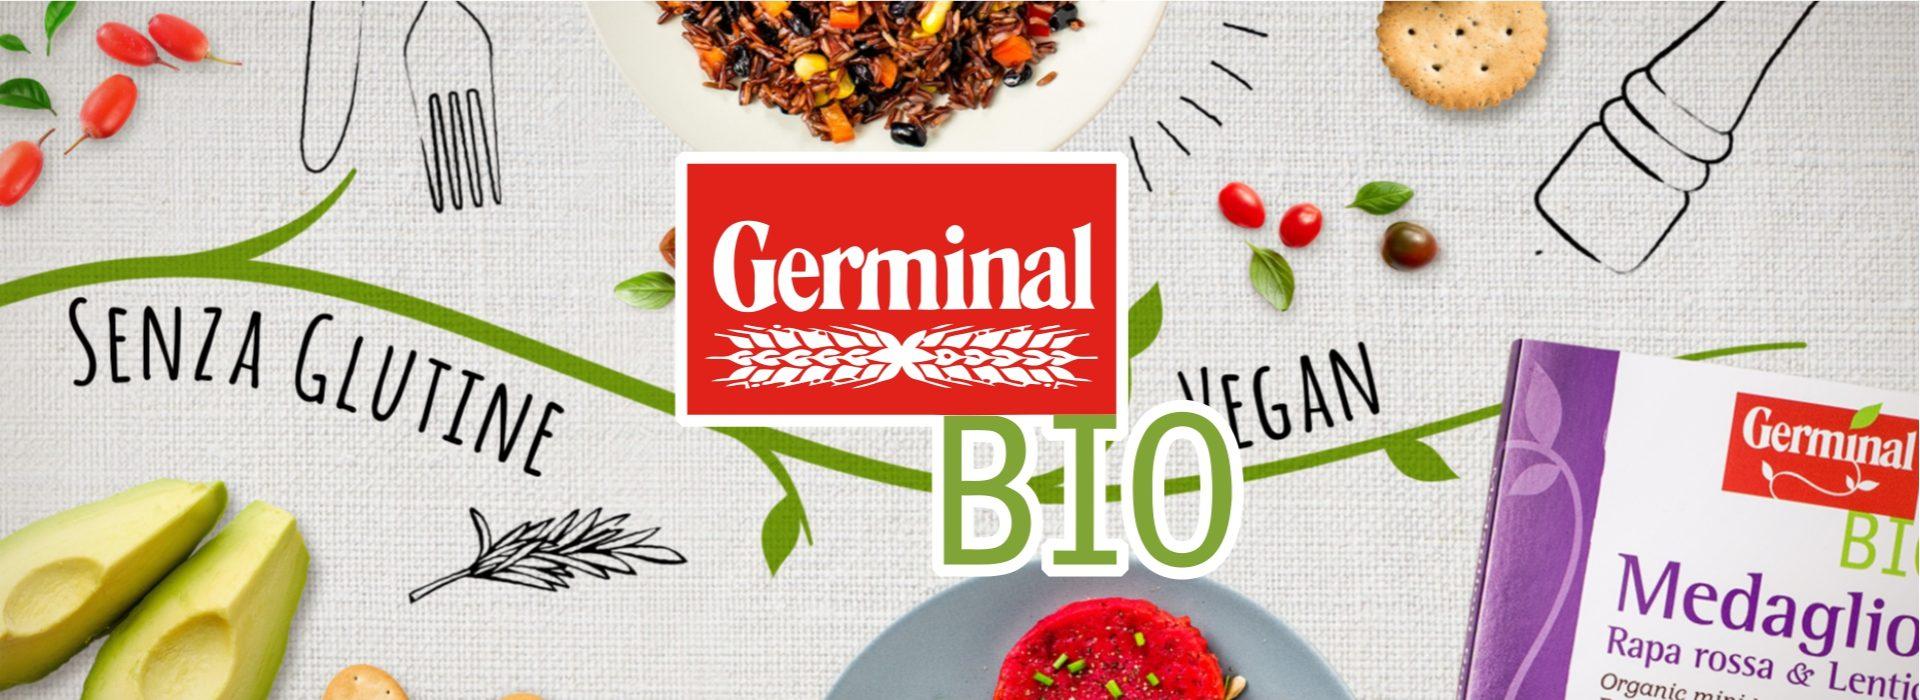 Germinal Bio prodotti biologici